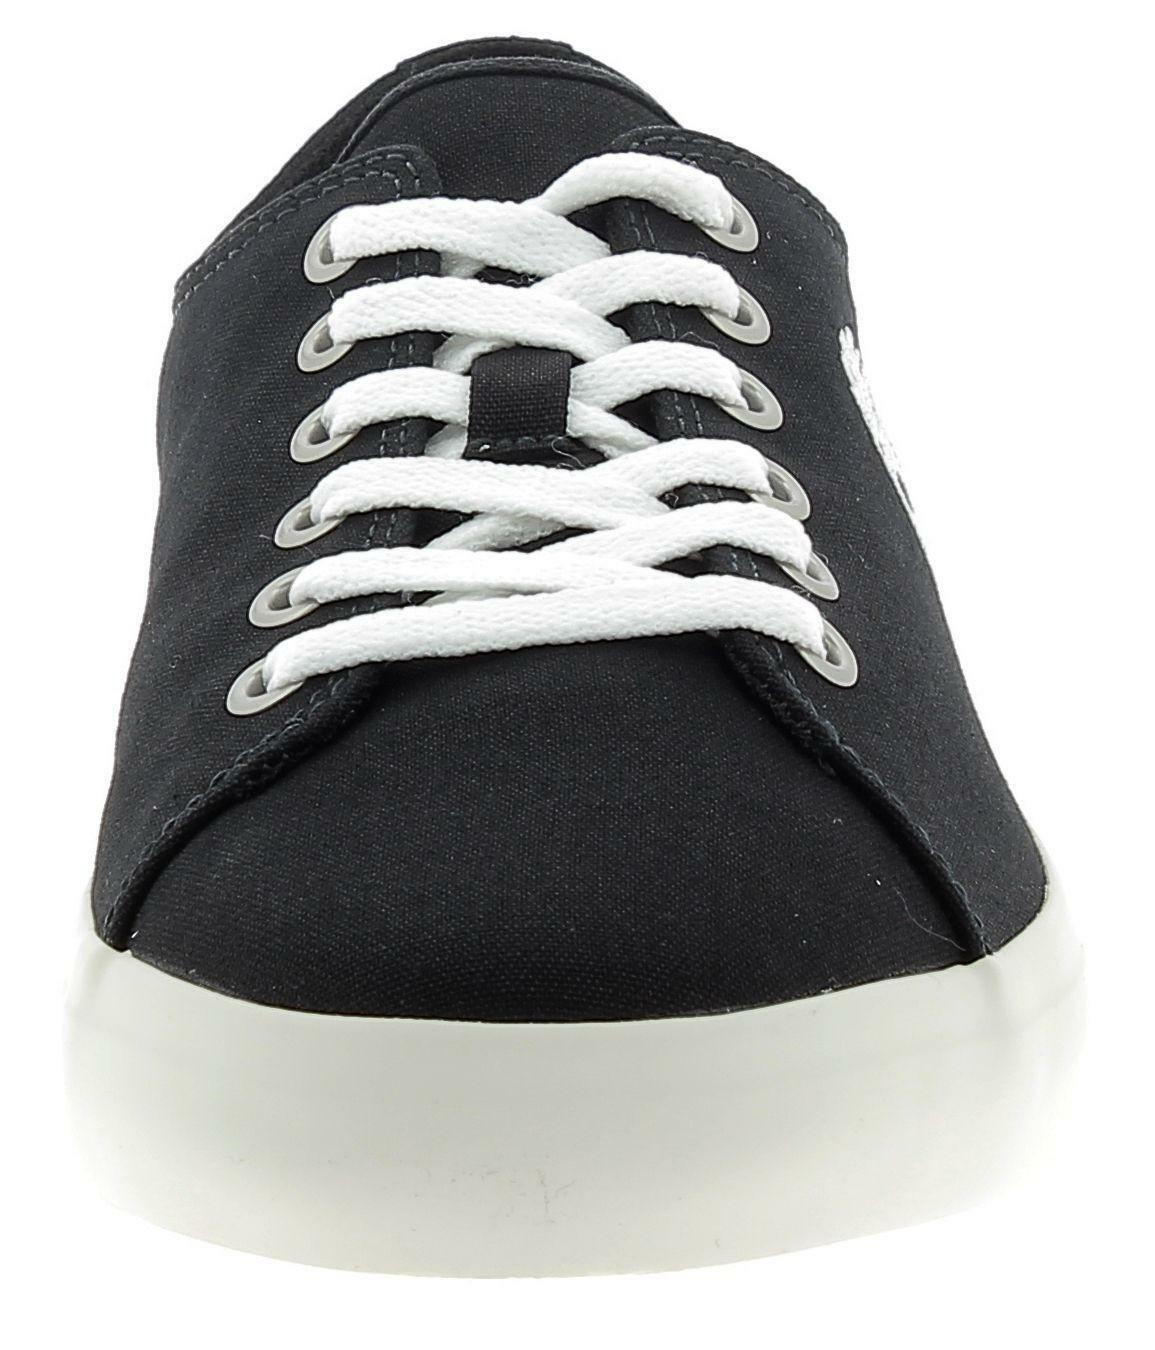 timberland timberland union wharf lace scarpe uomo nero